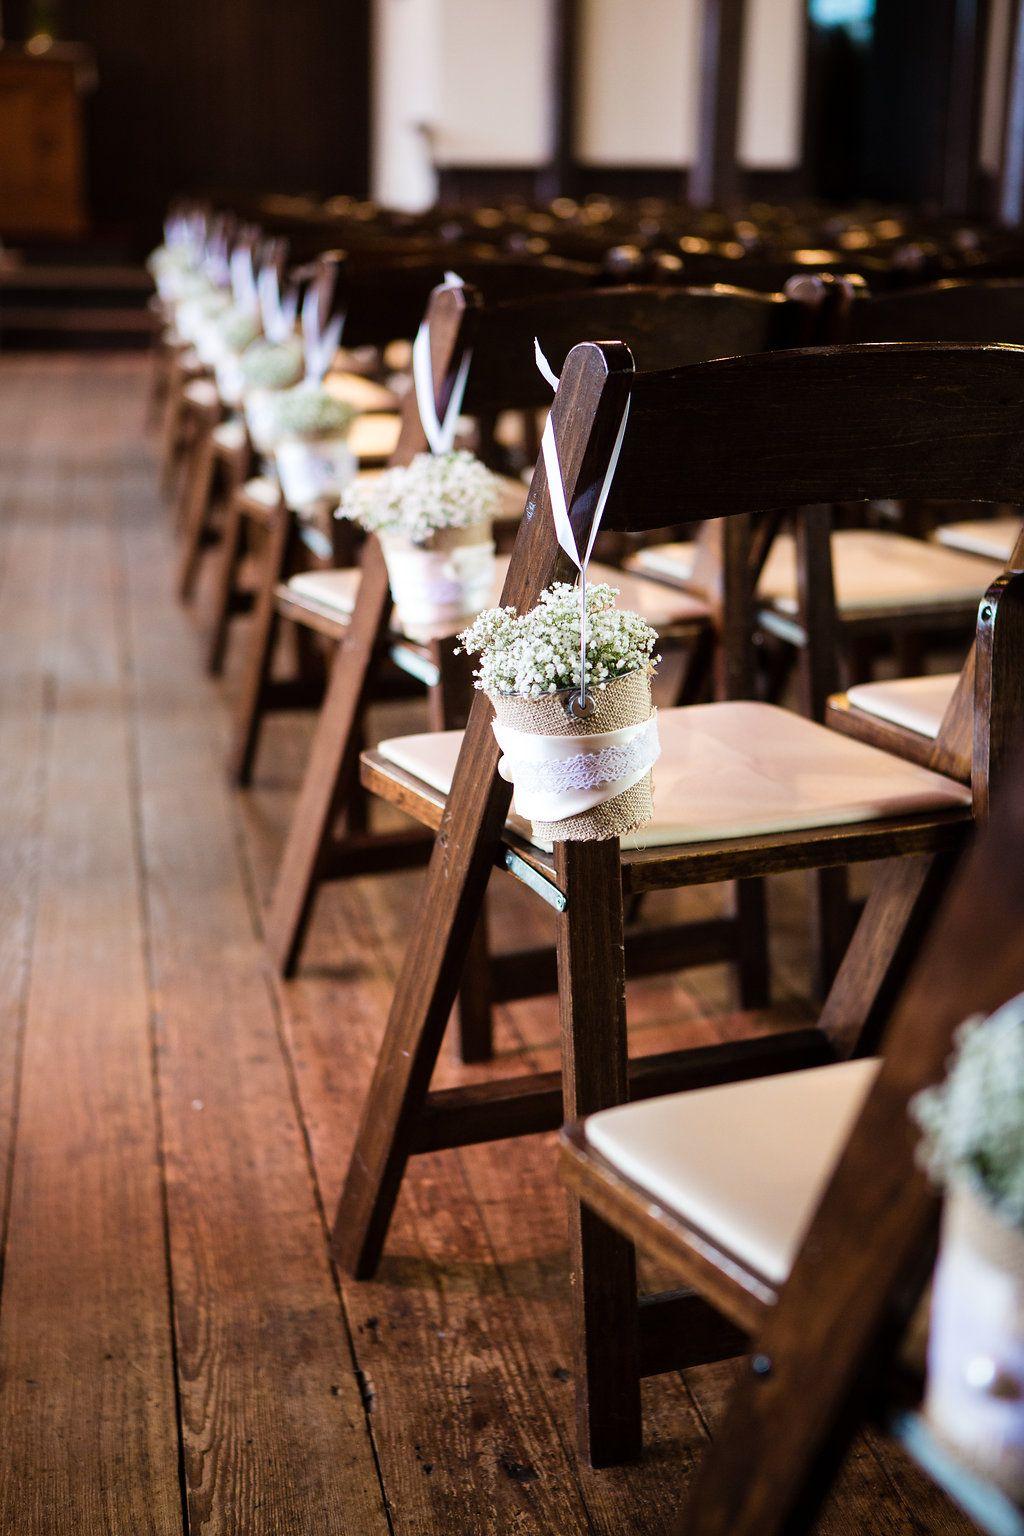 | Elaine & Zach | www.allsaints1875.com #allsaintschapel #allsaints1875  #downtownraleigh #weddingvenue  #ceremony #raleighweddingvenue